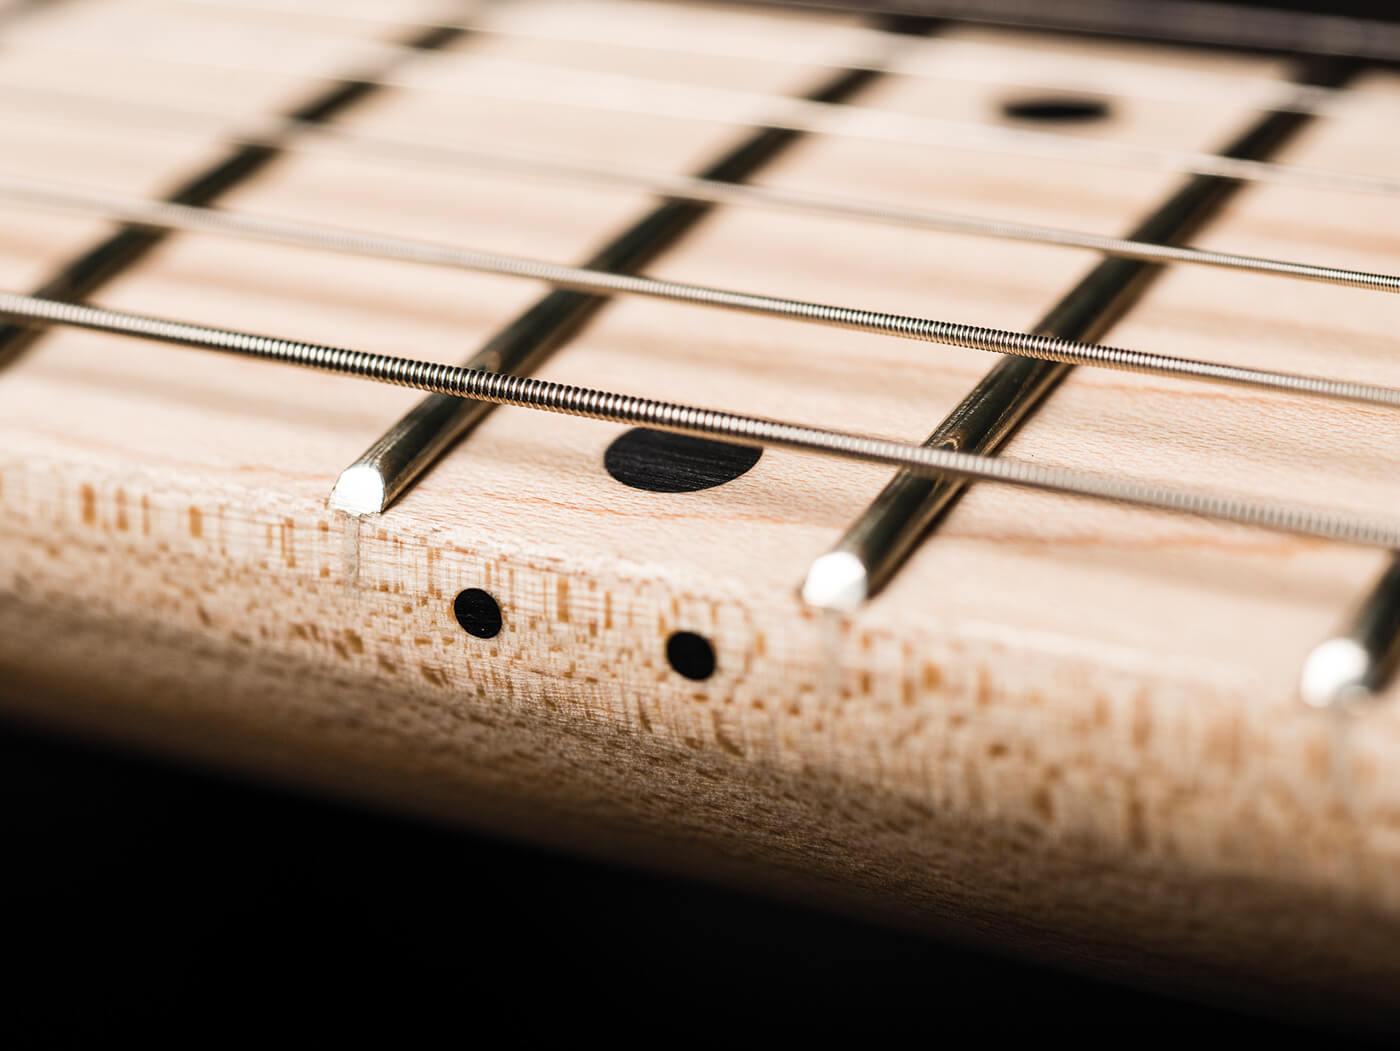 Sterling By Music Man Cutlass SSS & HSS fretboard